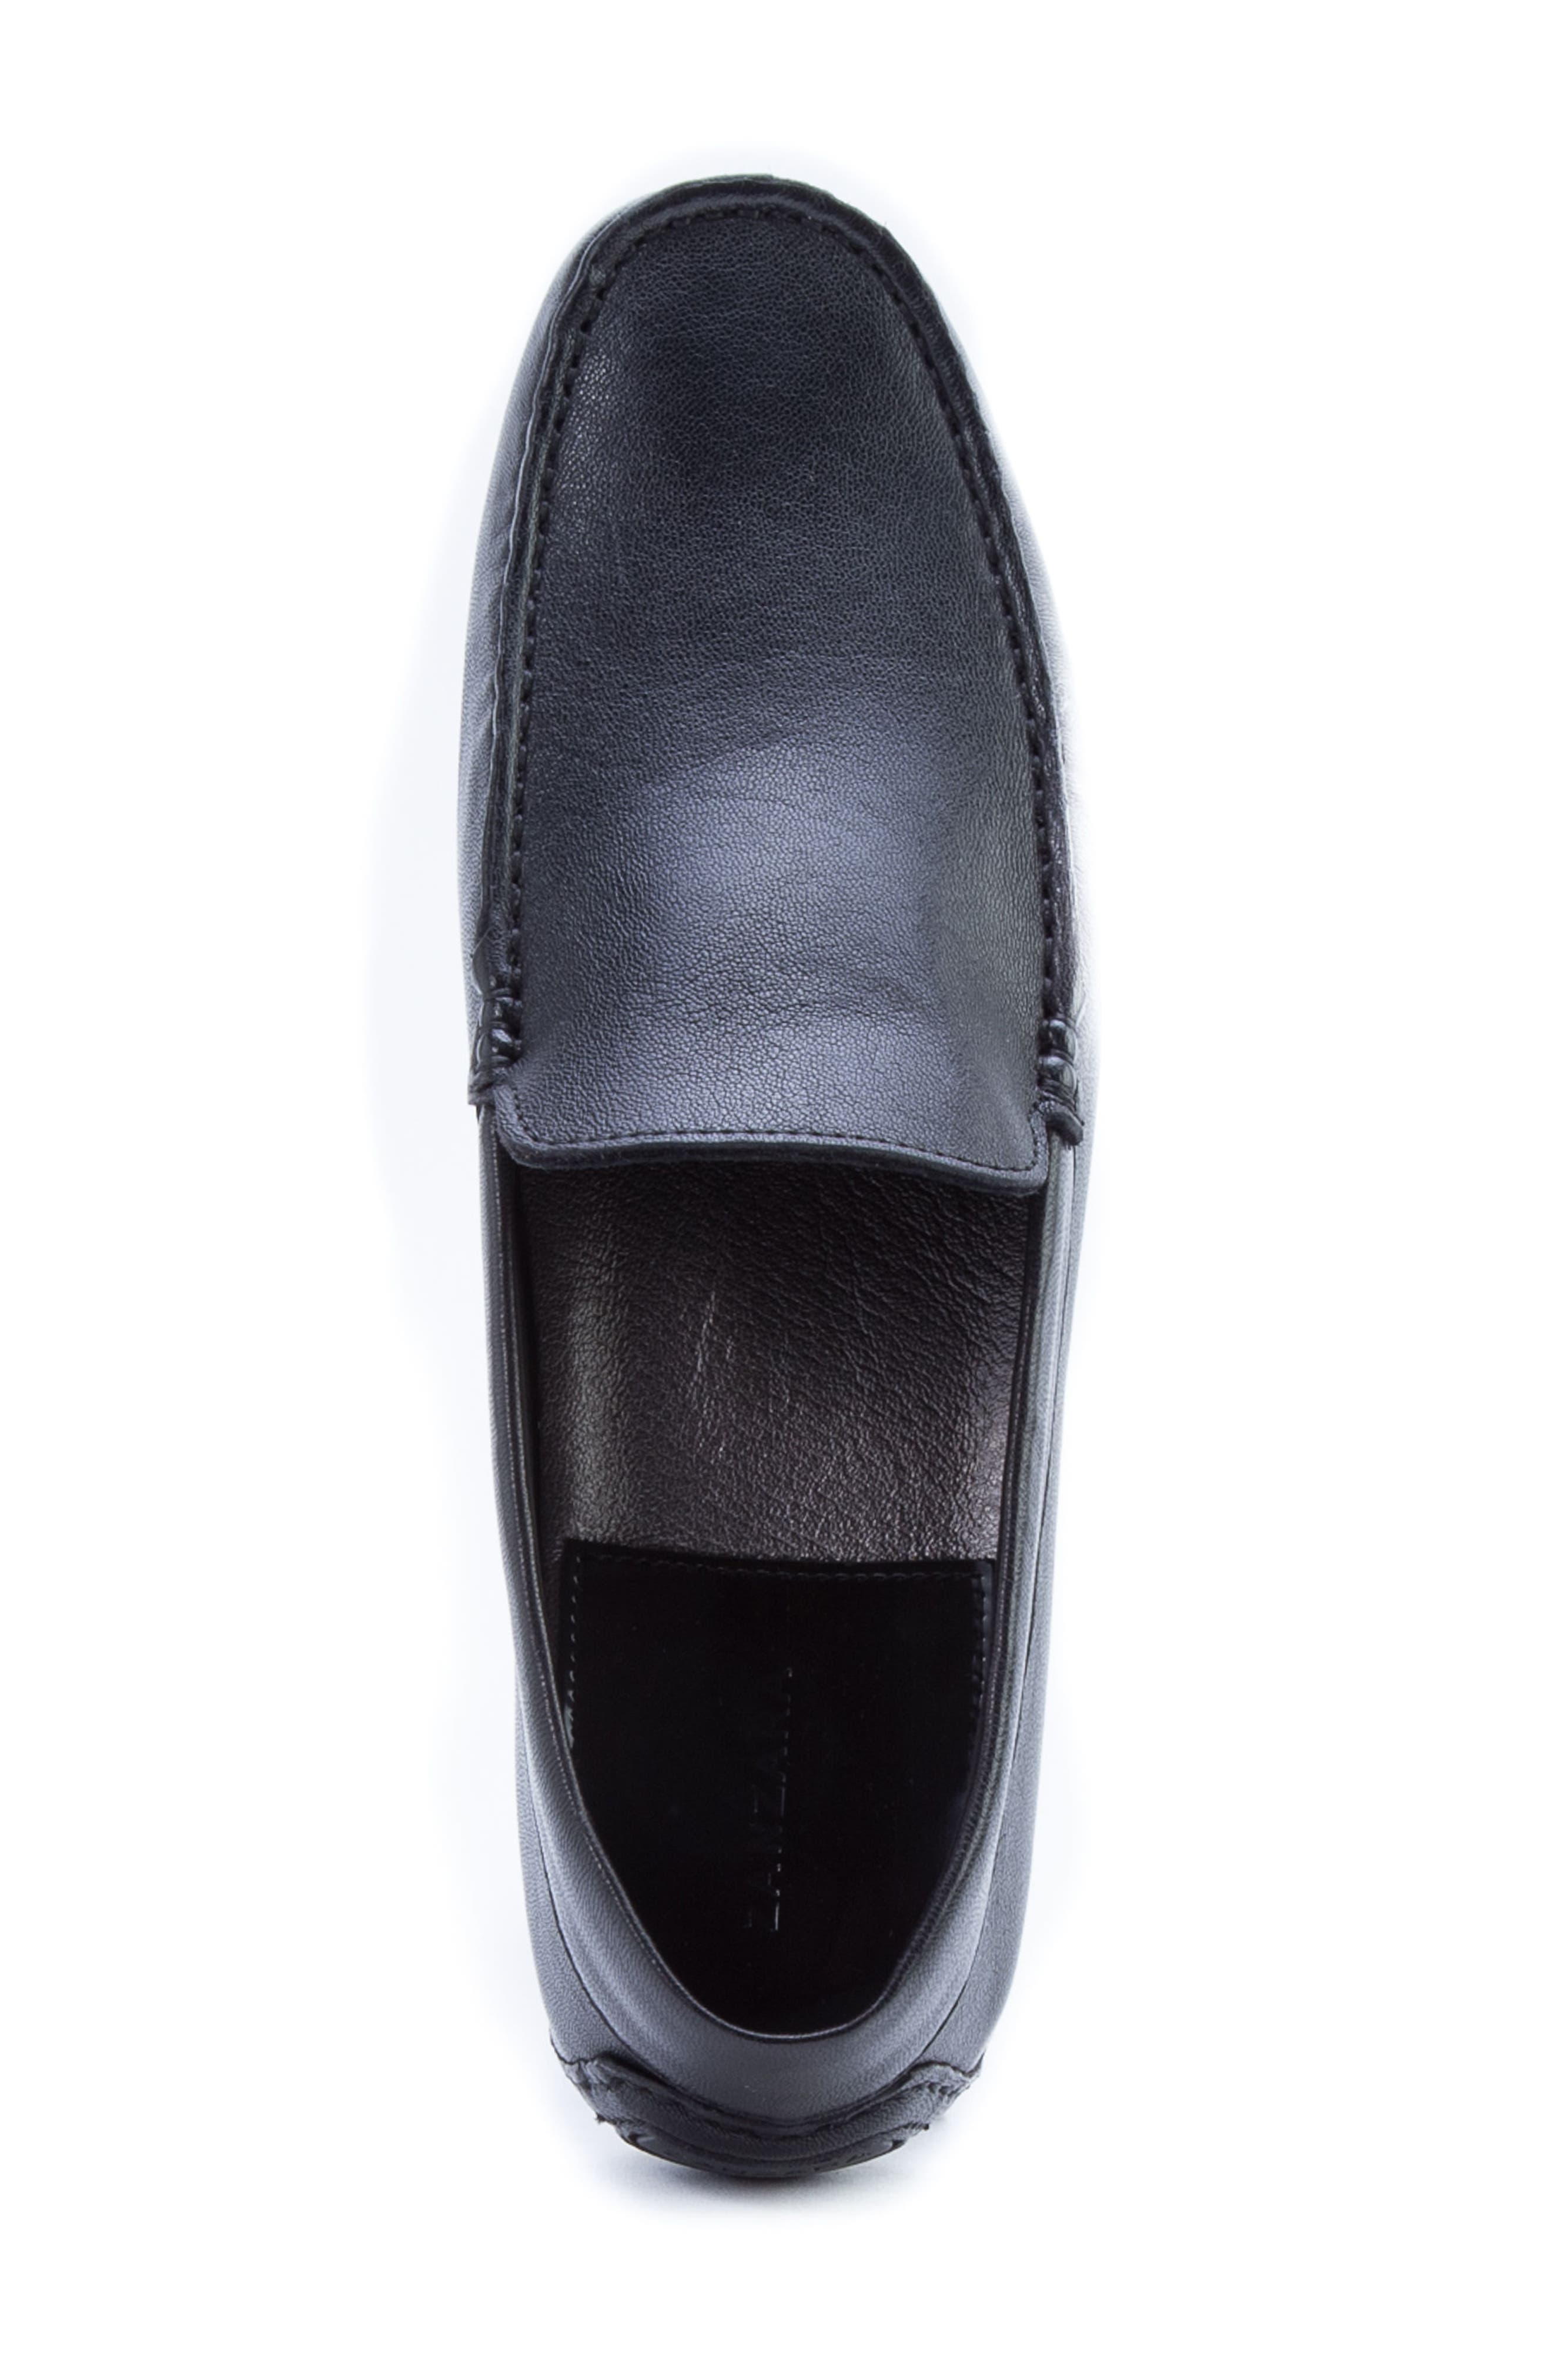 ZANZARA,                             Picasso 3 Moc Toe Driving Loafer,                             Alternate thumbnail 5, color,                             BLACK LEATHER